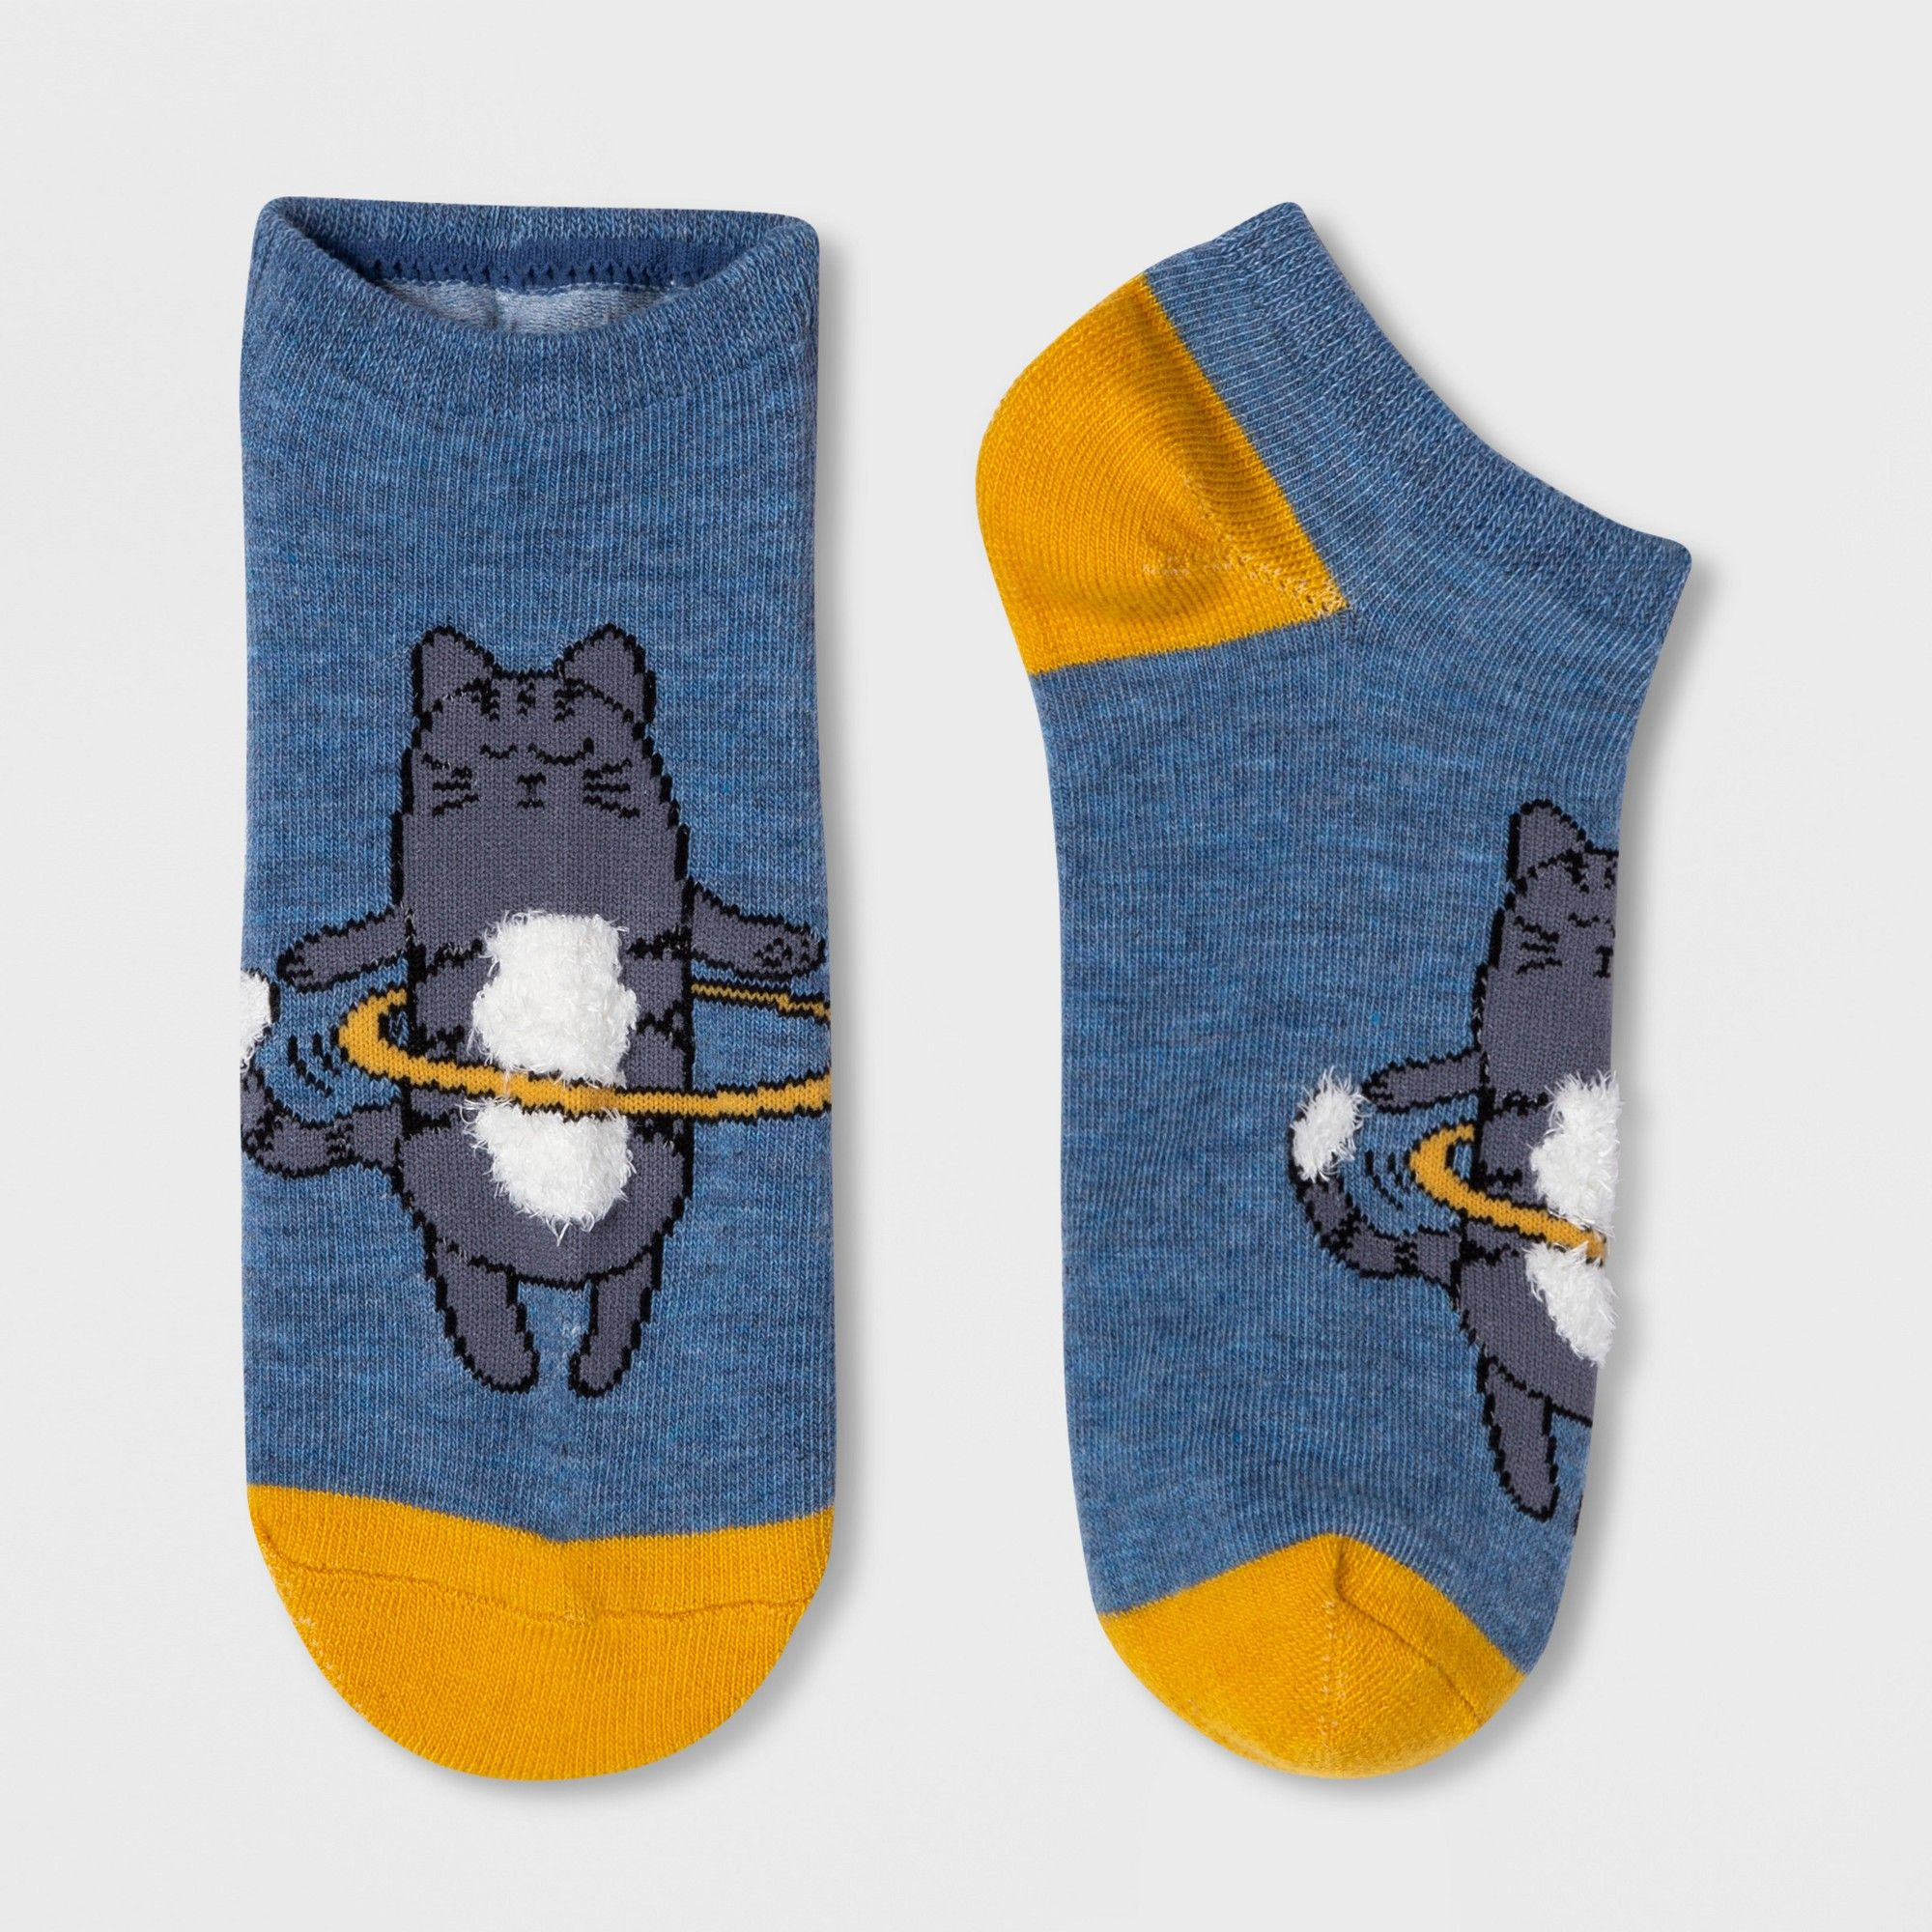 Mens athletic low cut Ankle sock Colorful dinosaurs blue background Comfort Short Socks